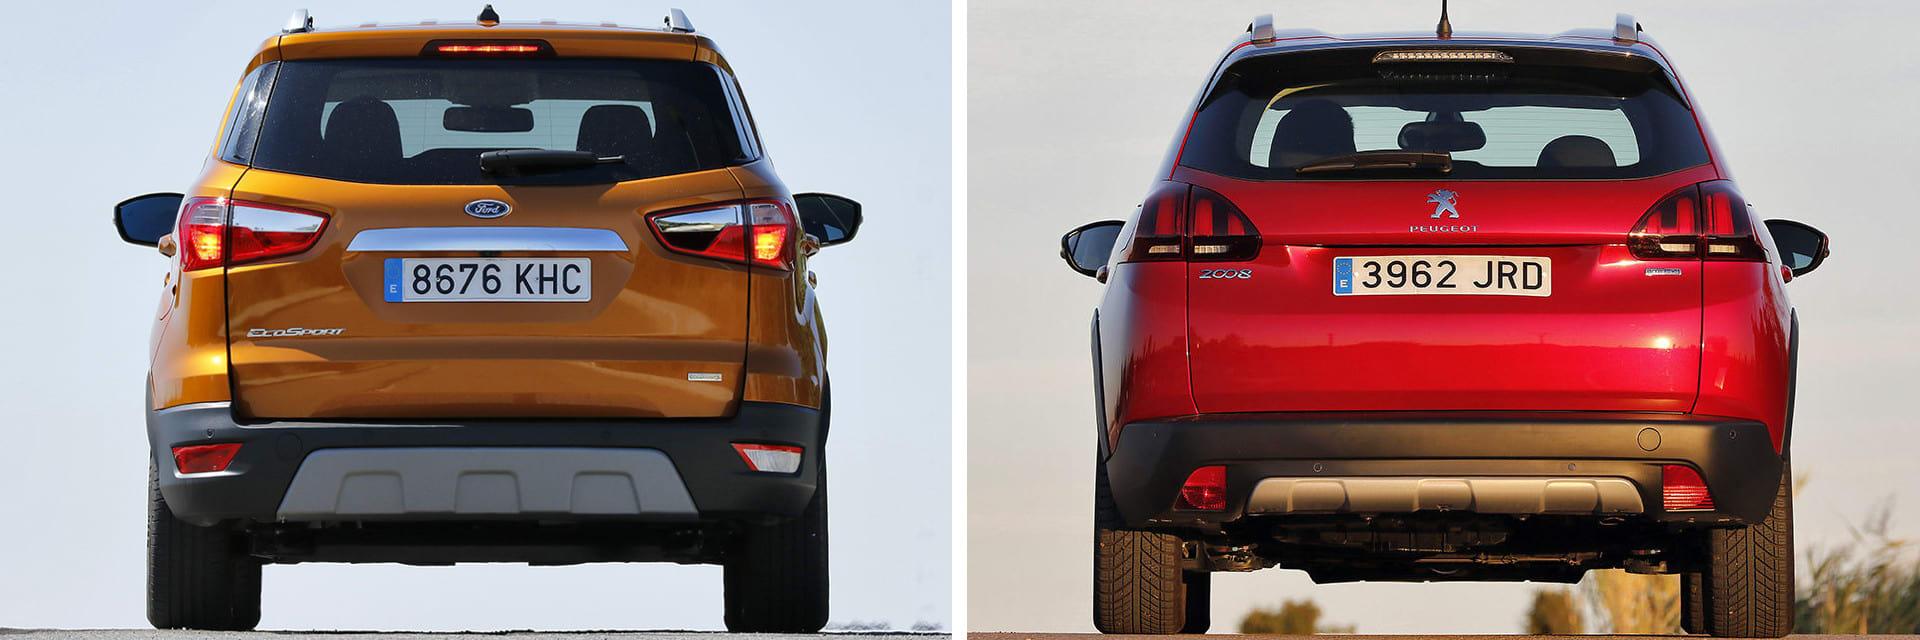 El Ford EcoSport Titanium de 140 CV tiene un precio de 20 252 euros (izq.) y el Peugeot 2008 GT Line de 130 CV, de 20 500 euros (dcha.)